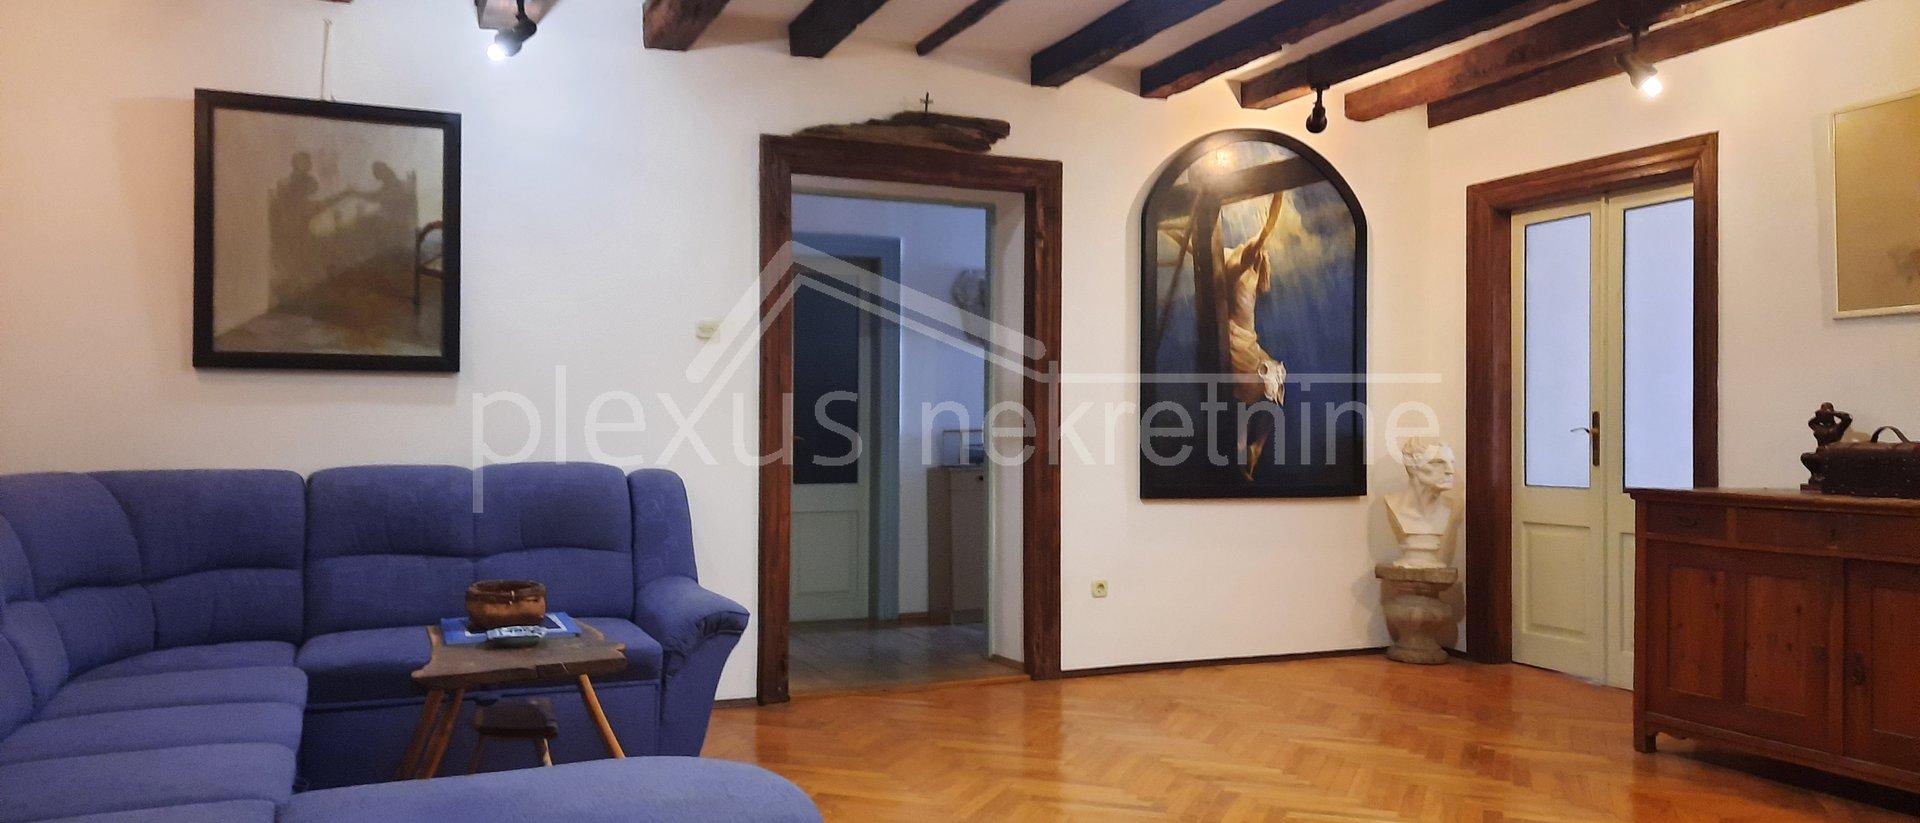 Dvoetažni stan u centru: Split, Grad, 226 m2